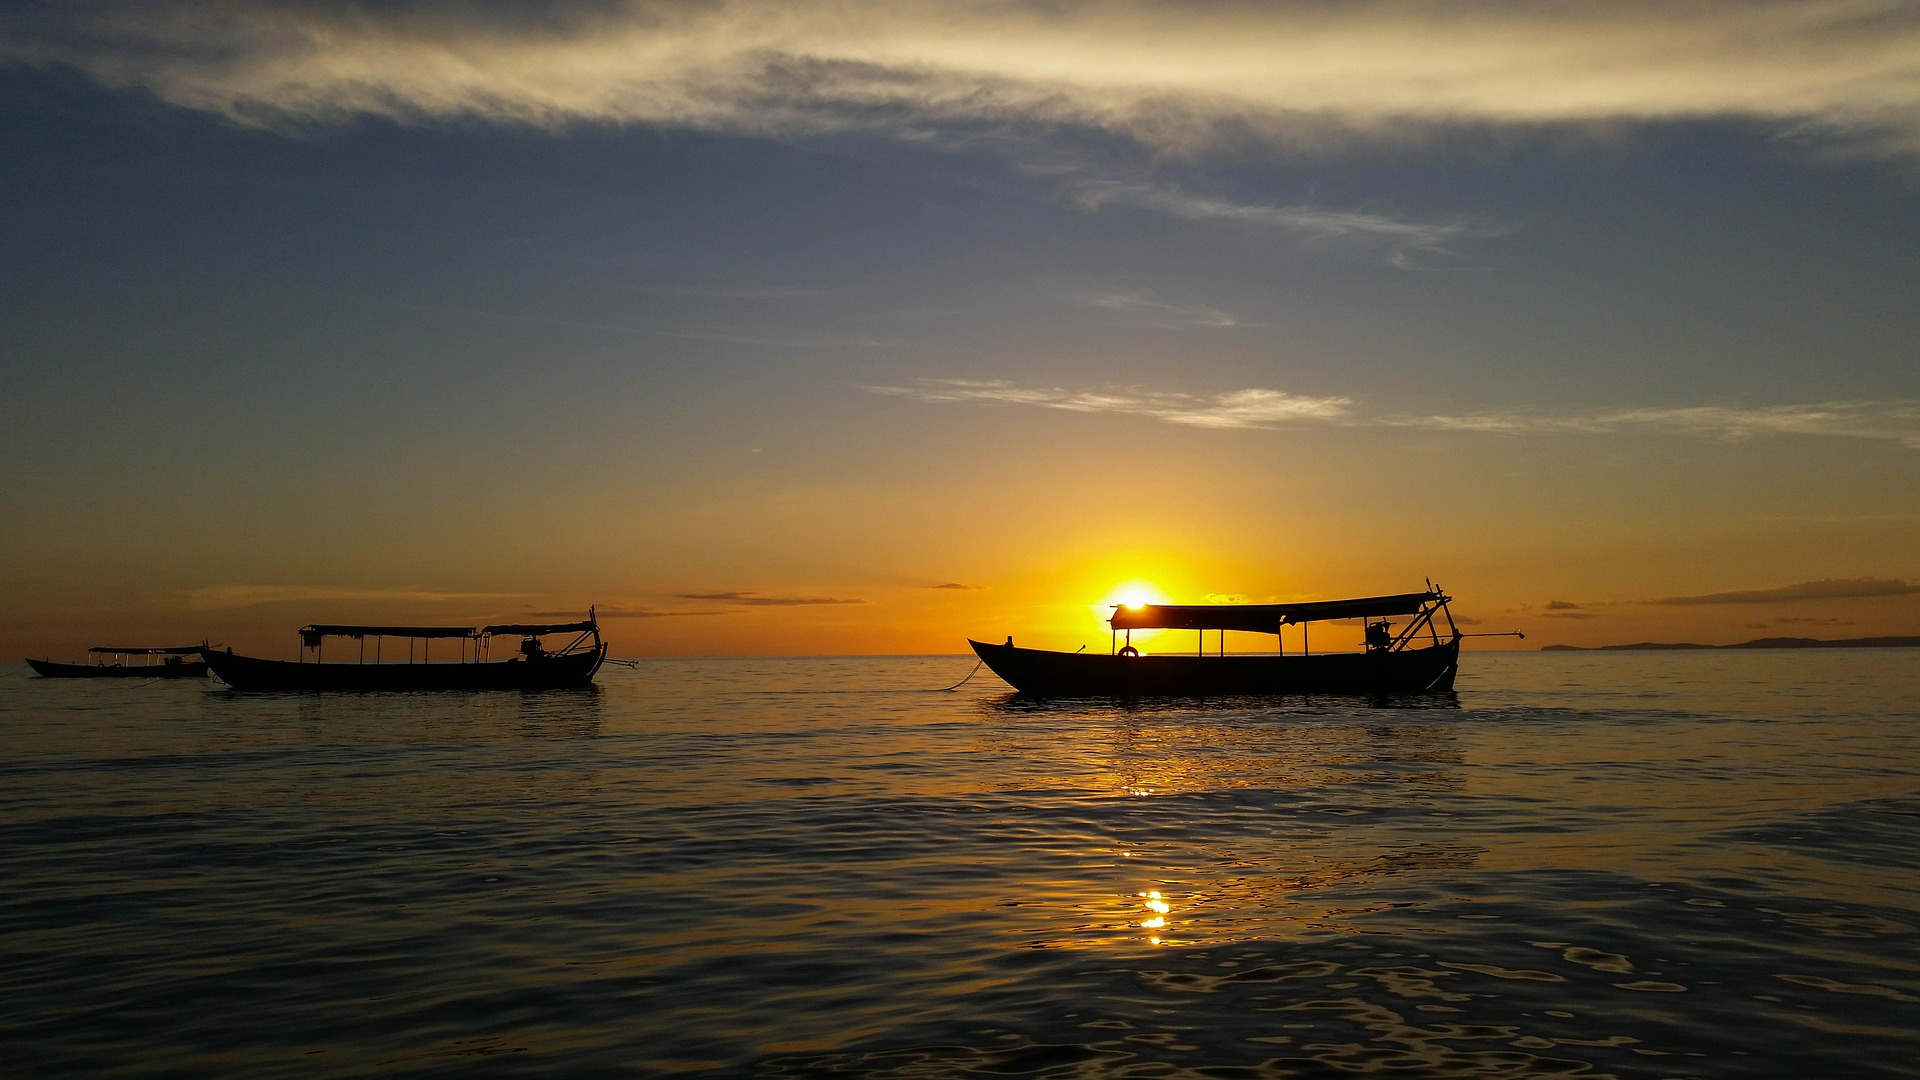 Sihanoukville, no Camboja, onde o meu passaporte foi passar férias sem im